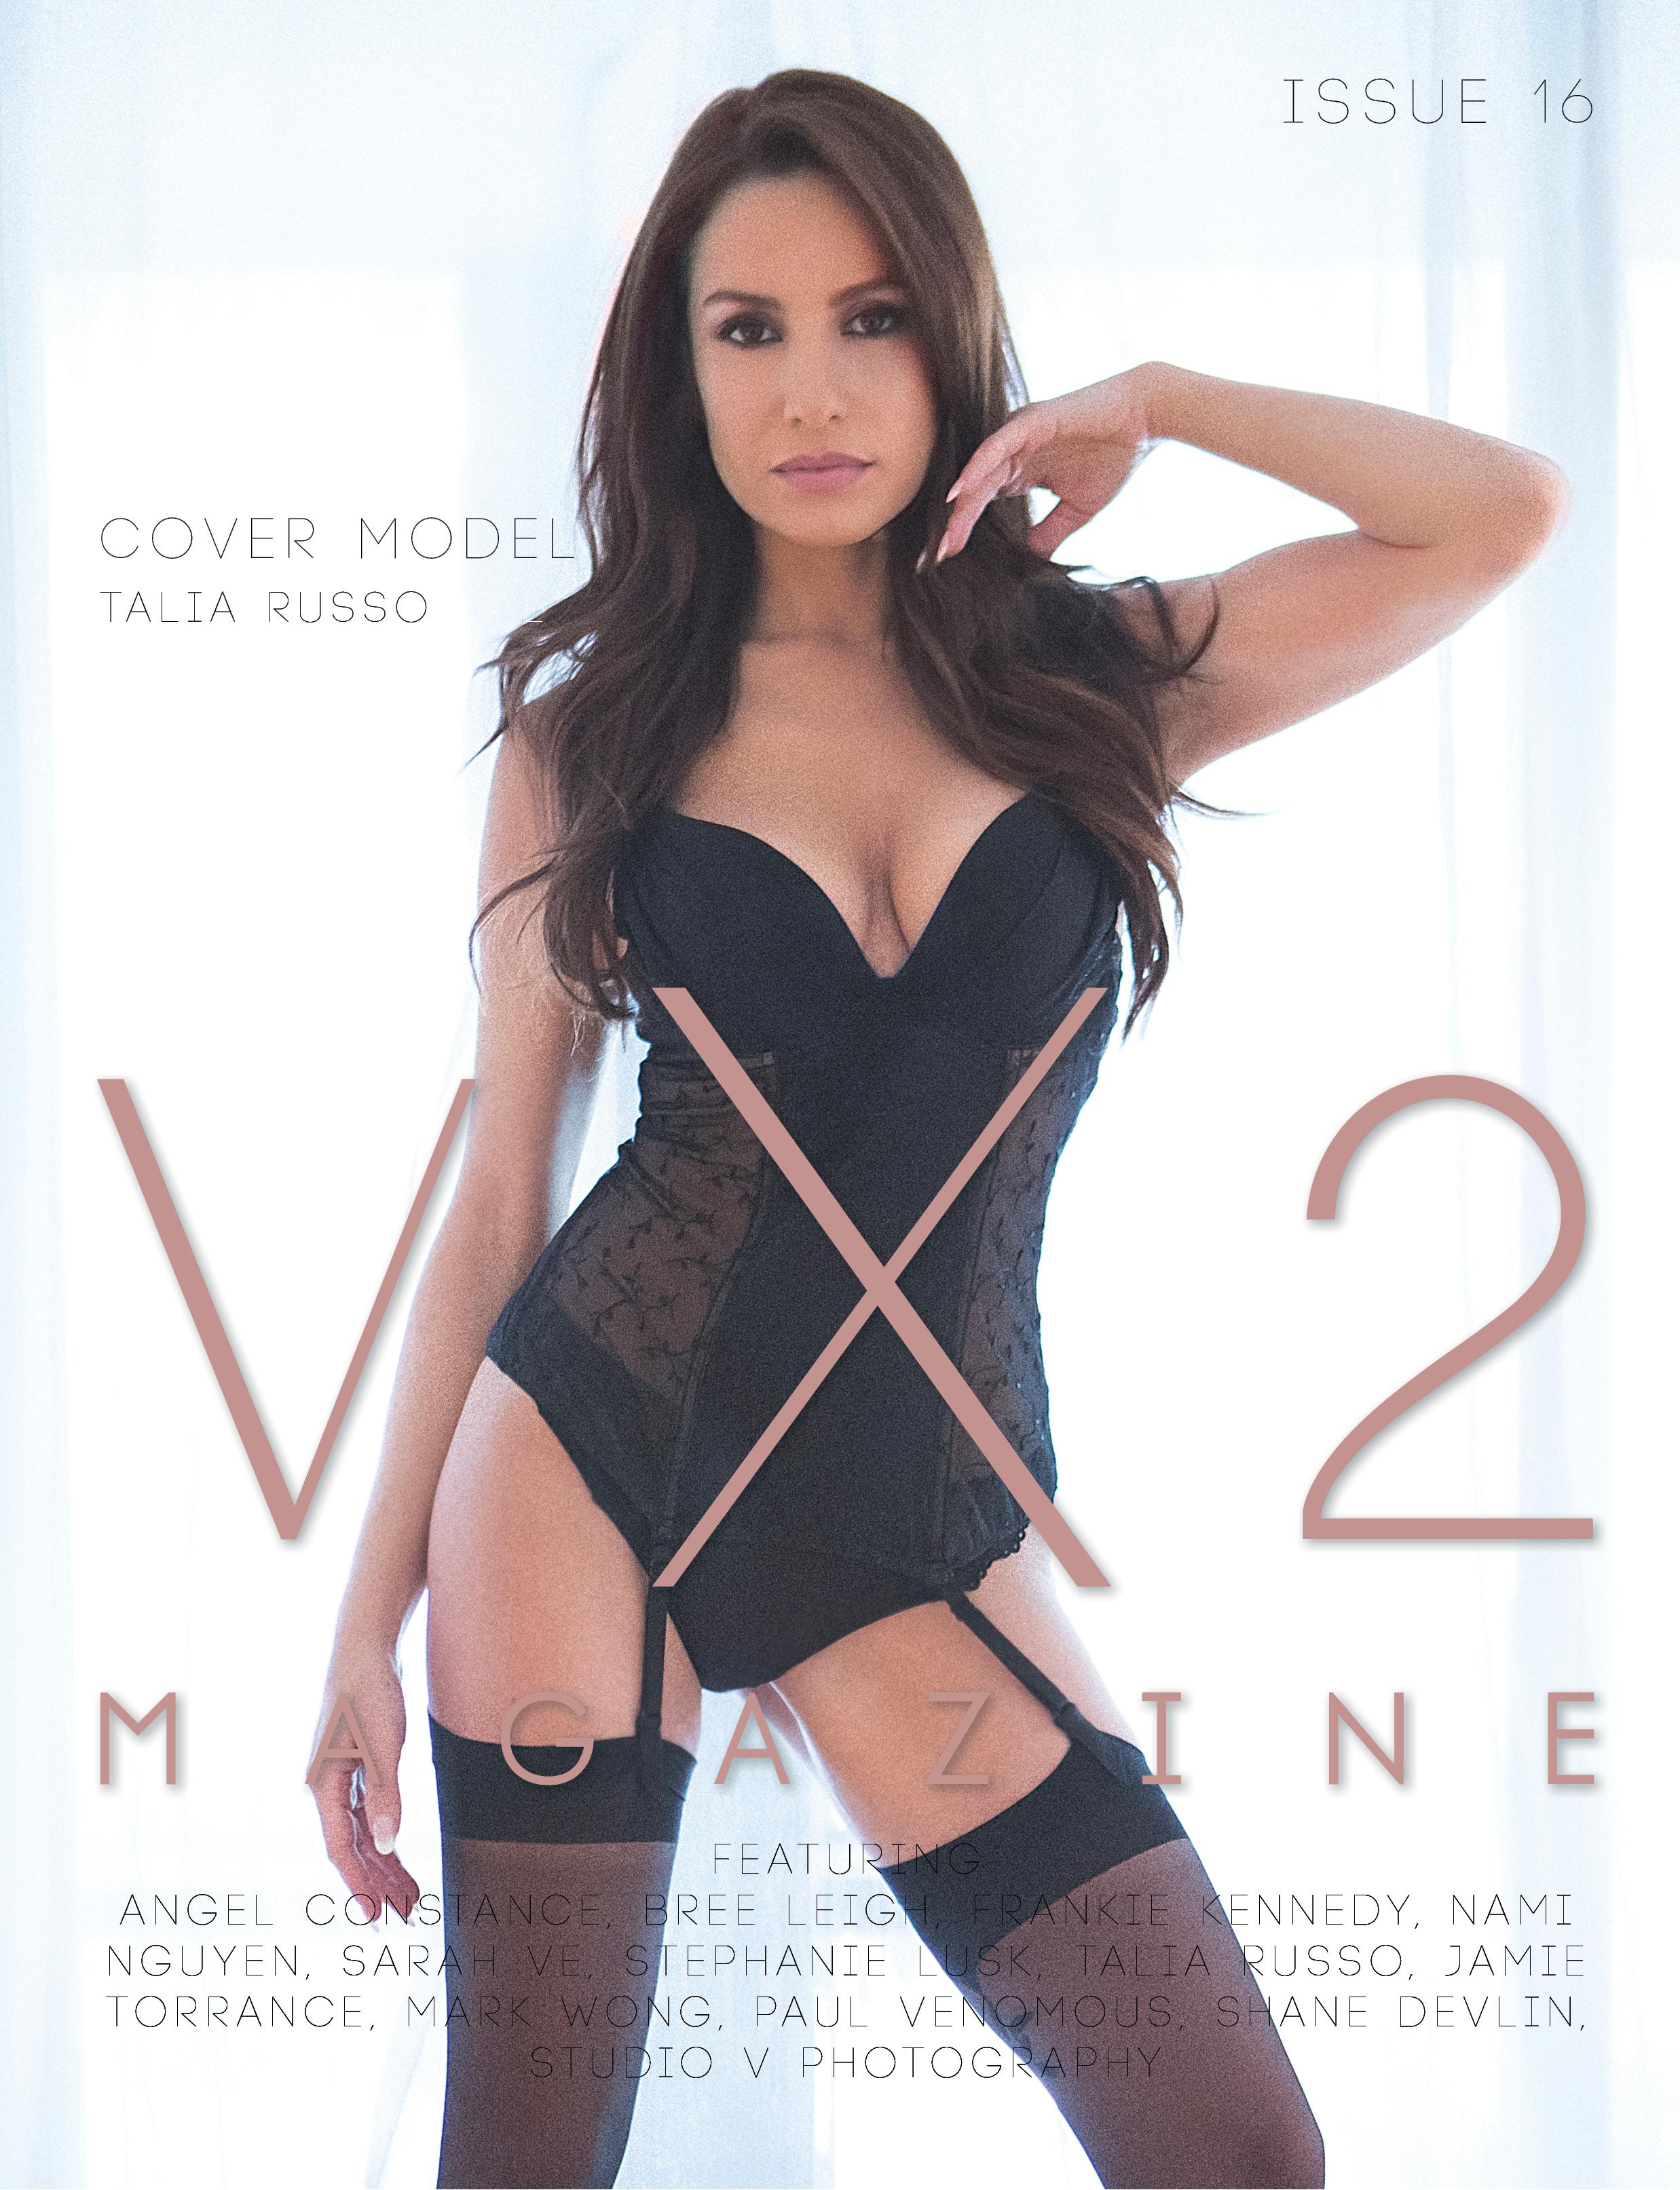 VX2 Magazine Issue 16 (2018) Talia Russo cover model.jpg